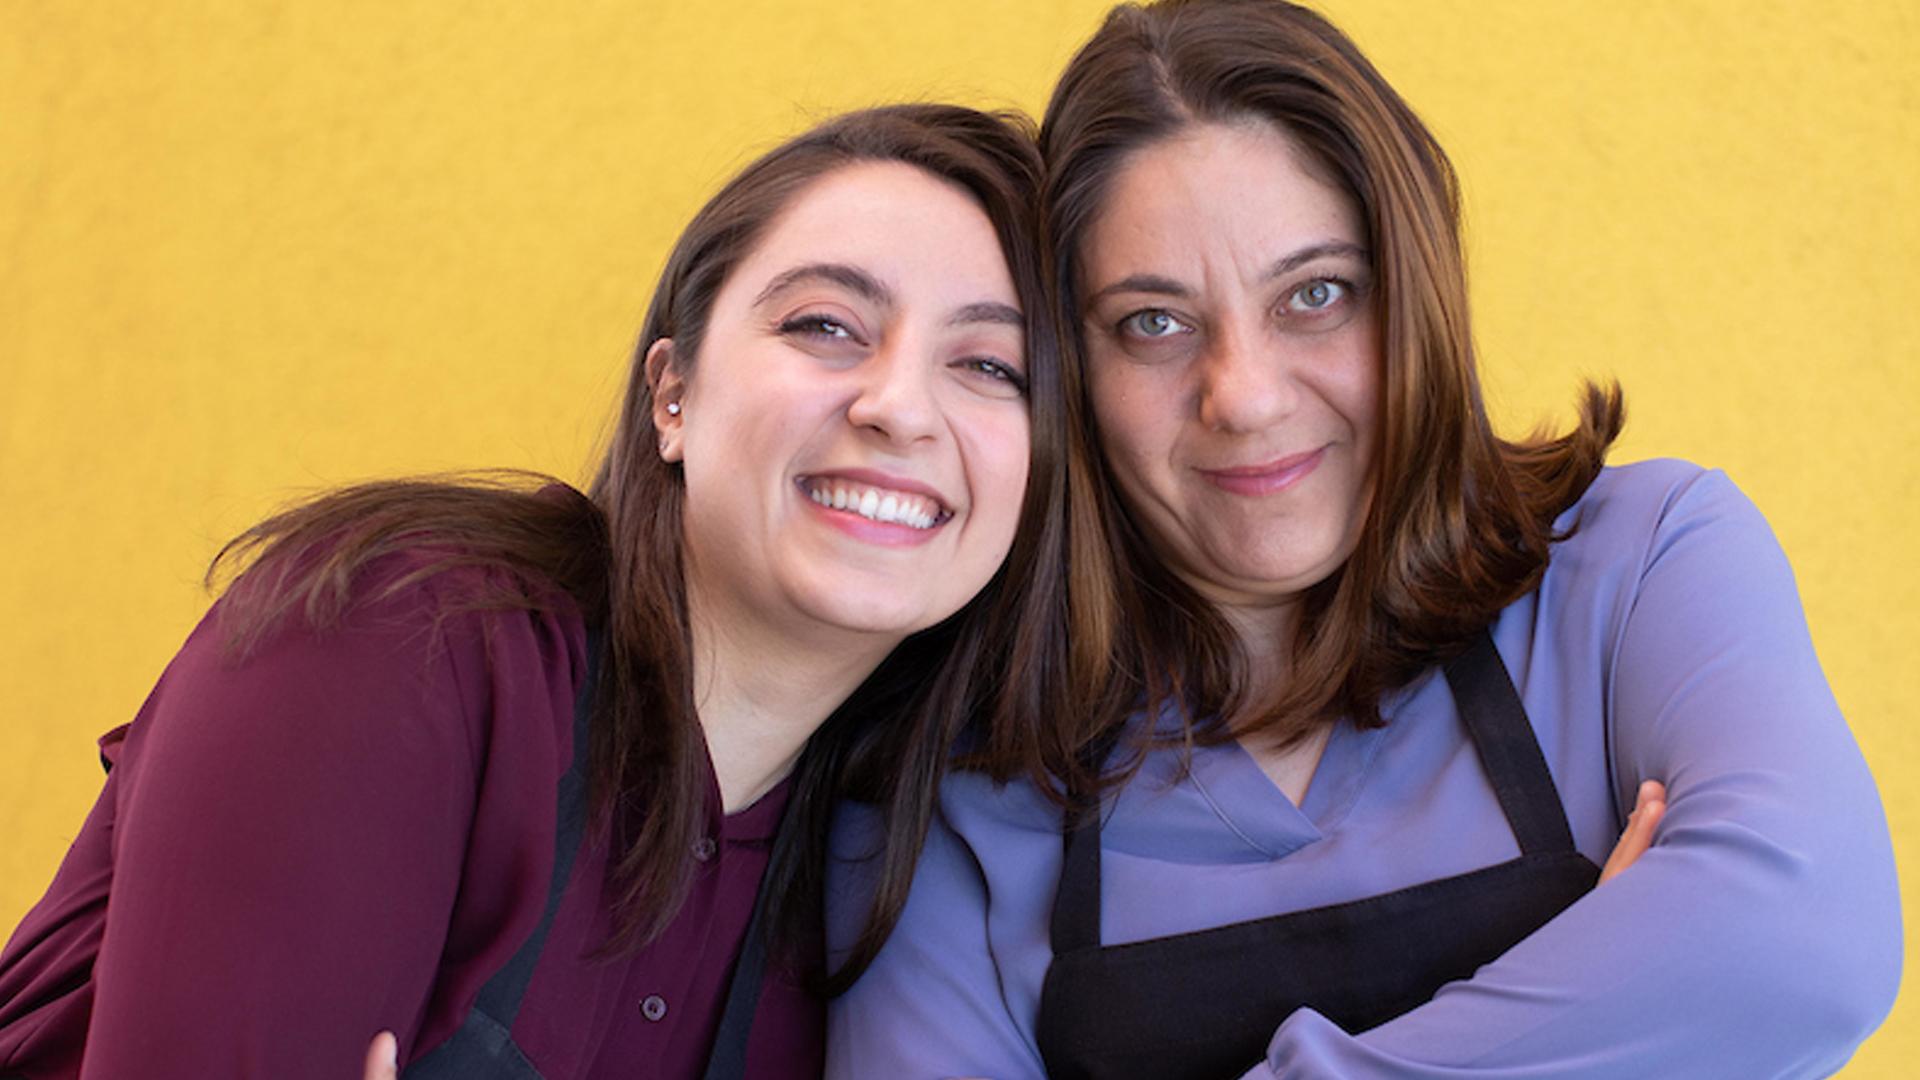 Vian Al Nidawi (right) and her daughter Sara Nassr